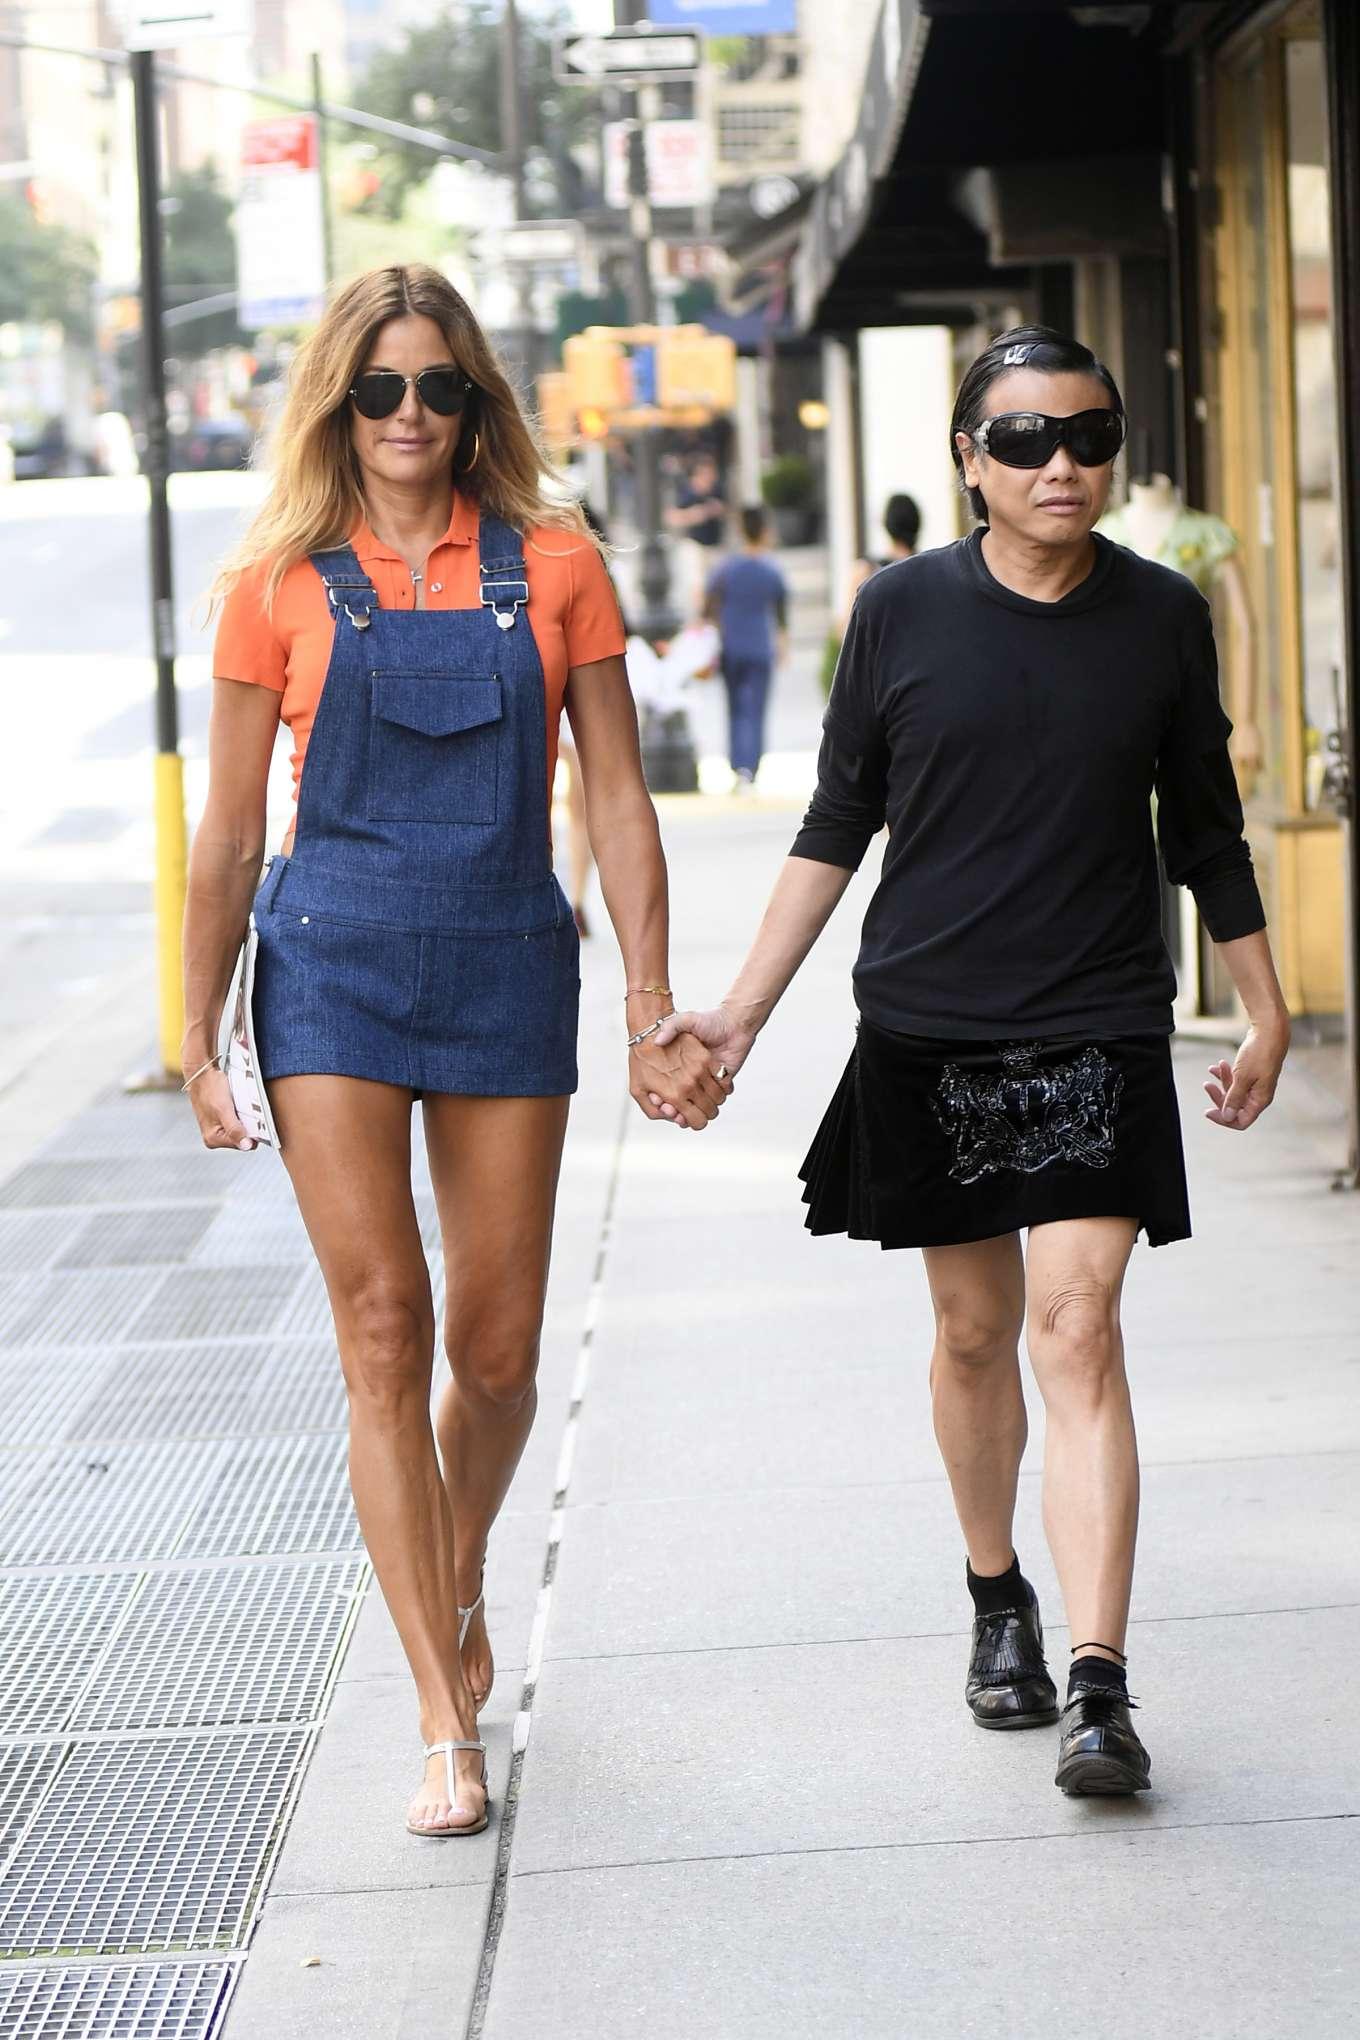 Kelly Bensimon with Fashion Designer Zang Toi on Madison Avenue in New York